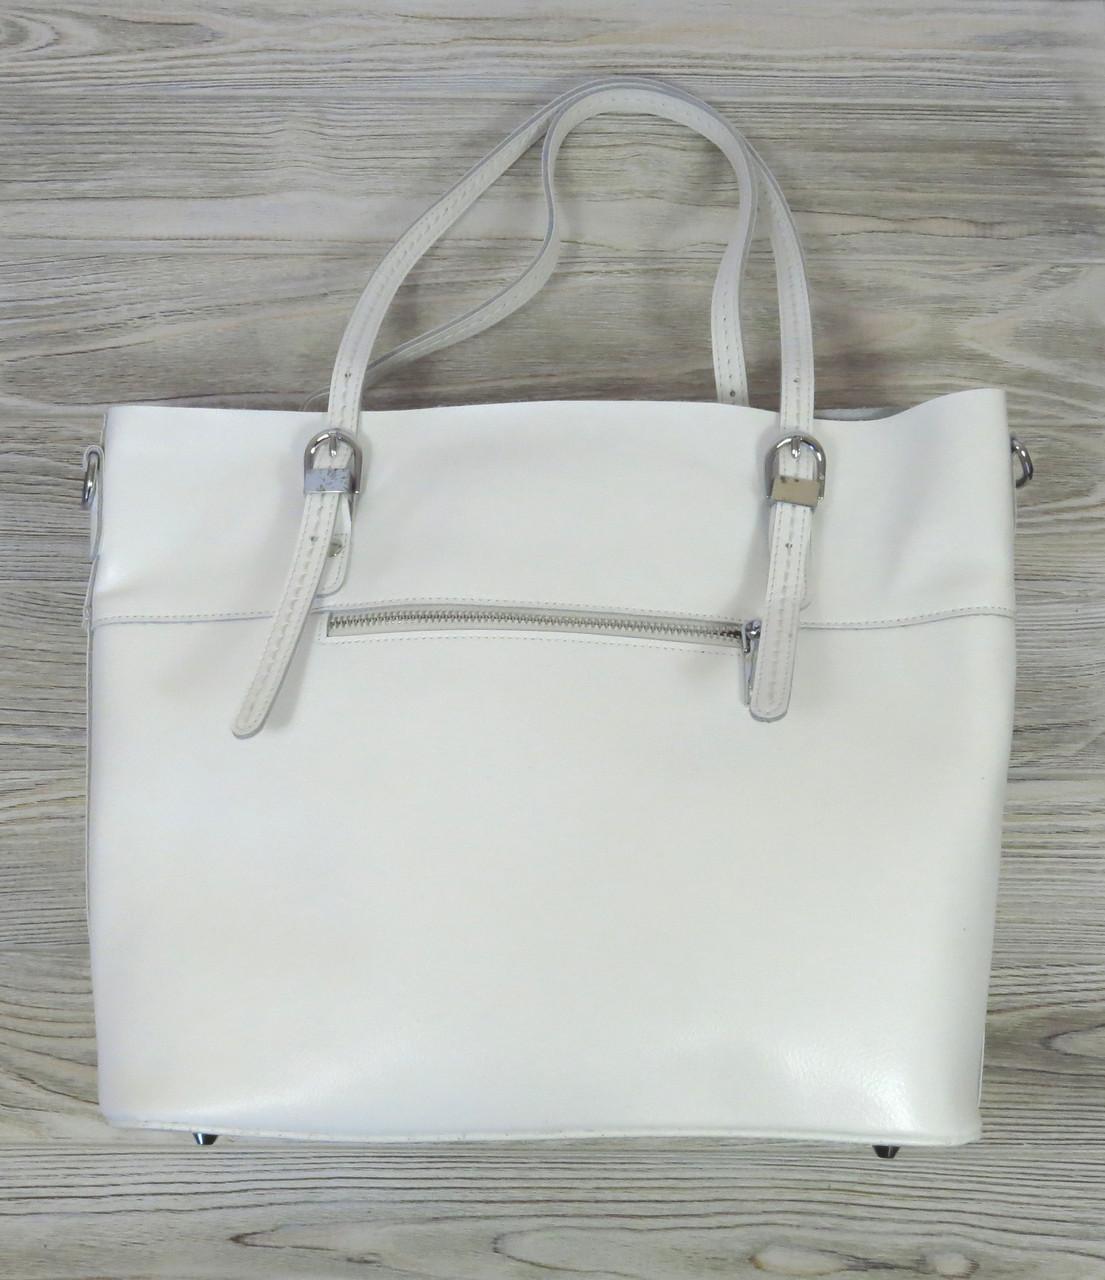 Белая женская сумка Farfallo Rosso